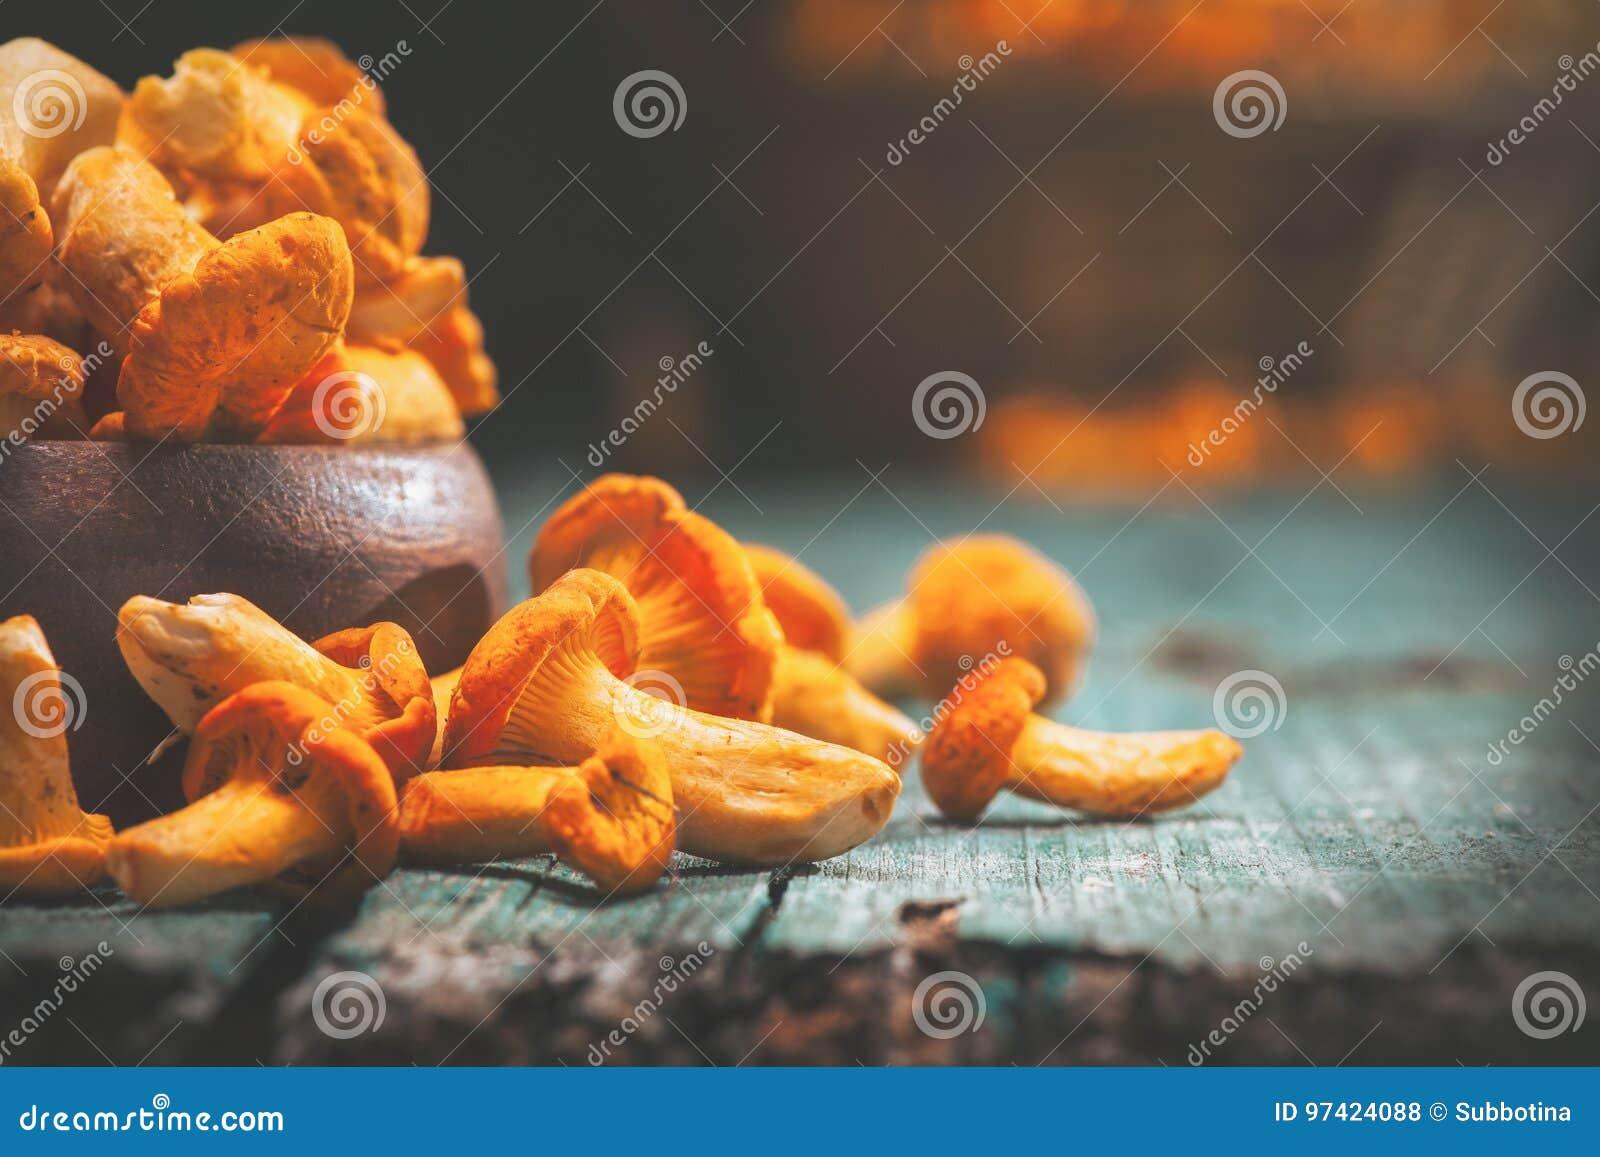 Raw wild chanterelles mushrooms in a bowl